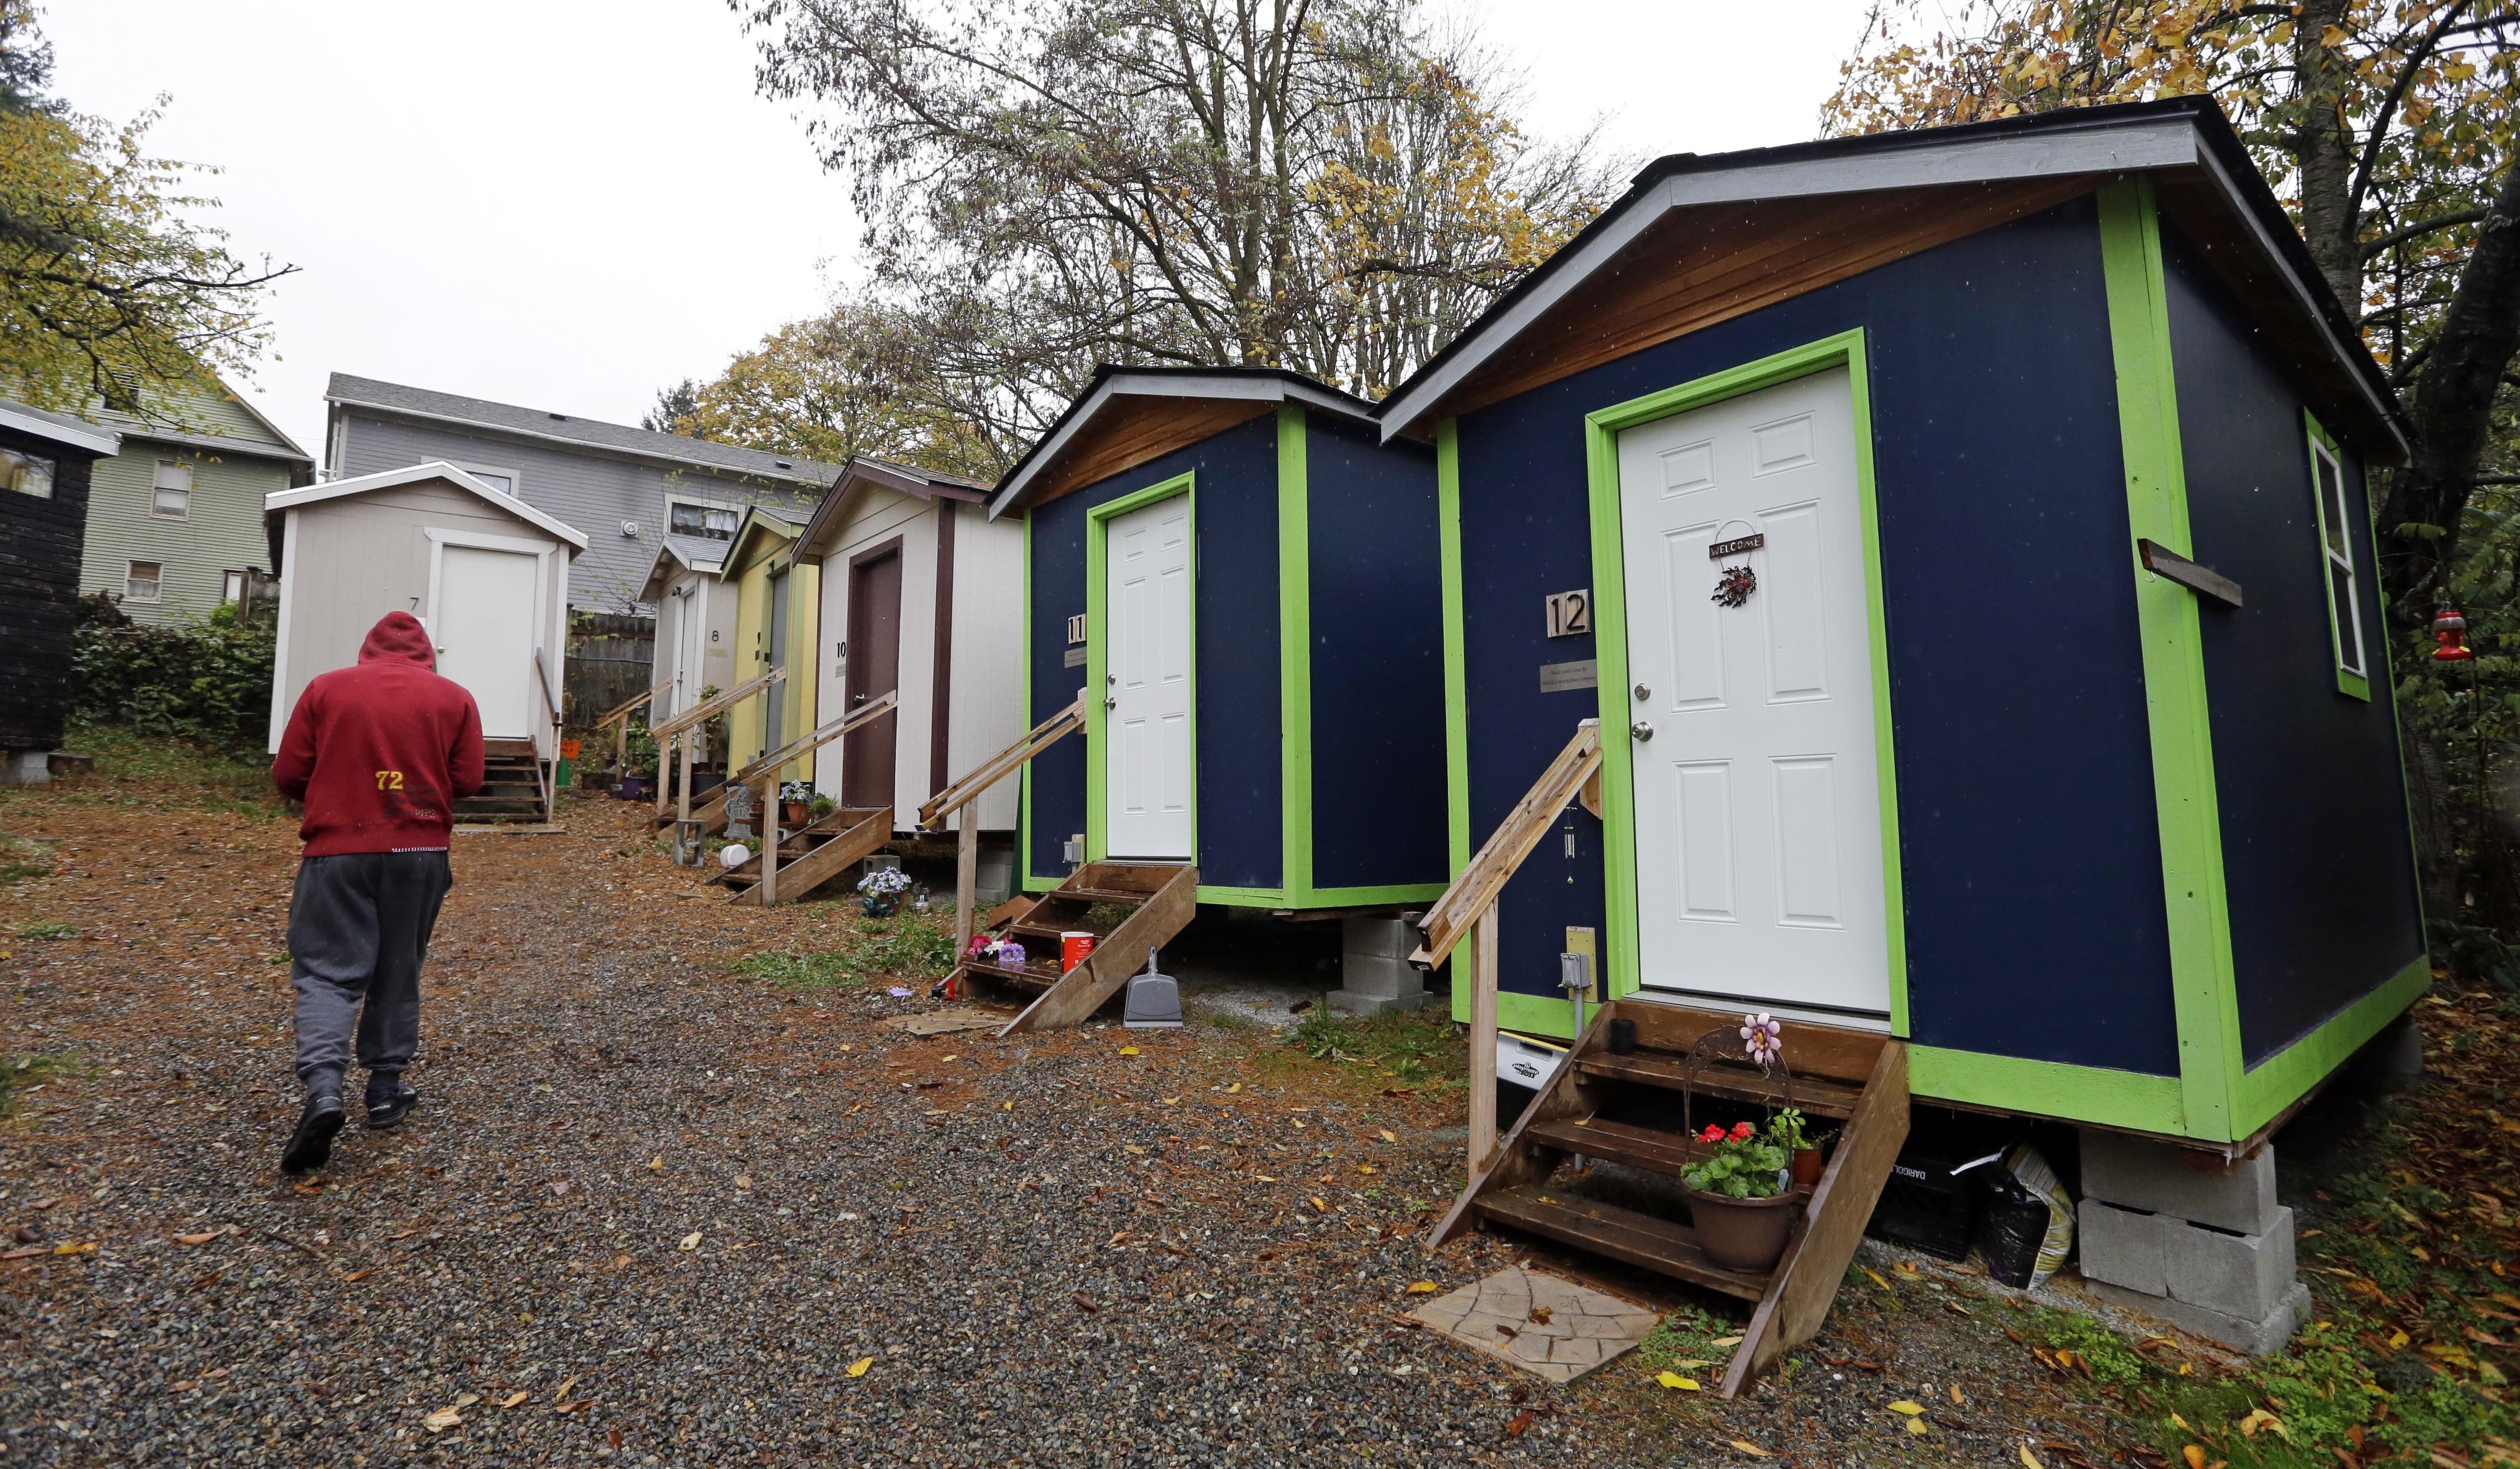 house for the homeless